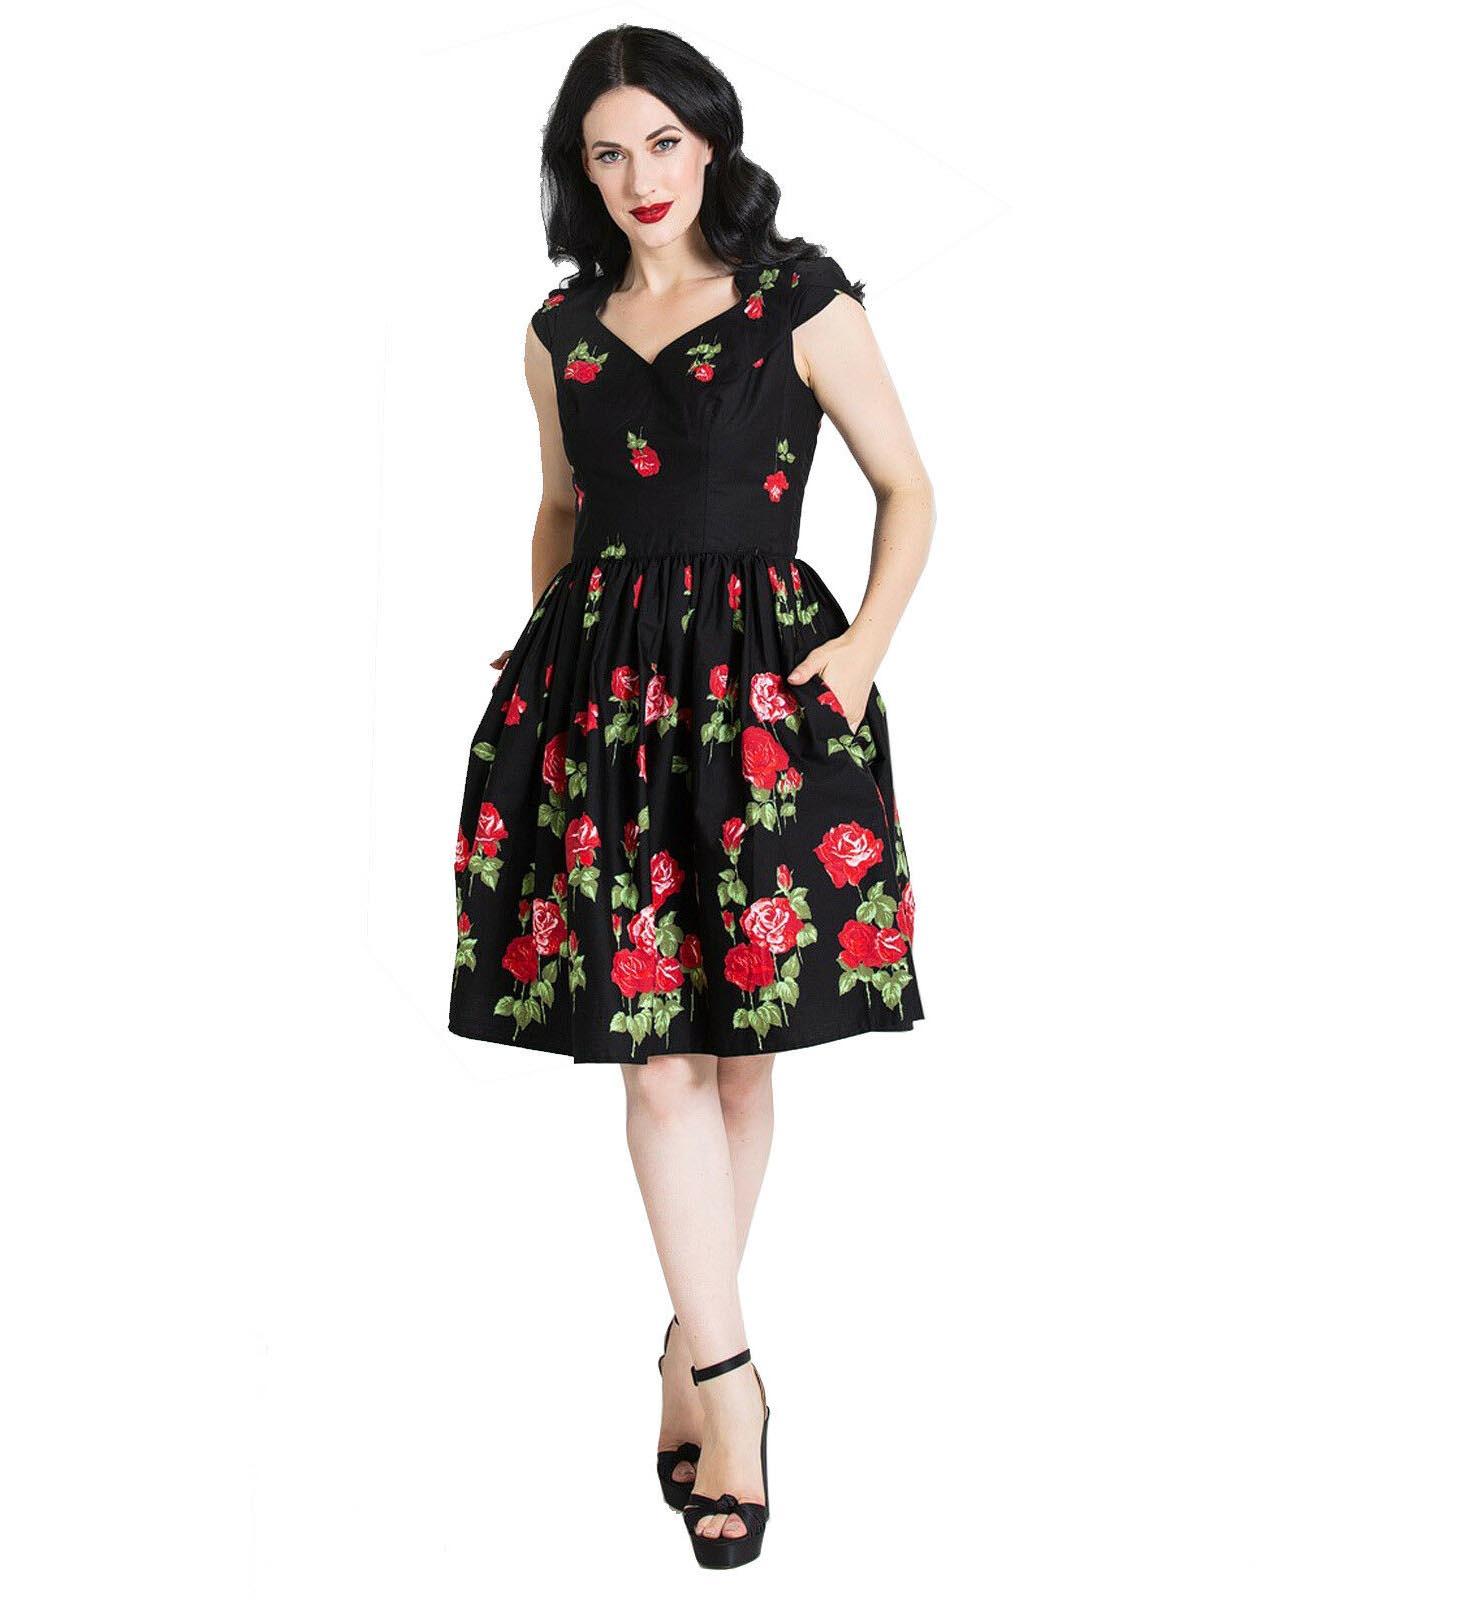 Hell-Bunny-Pin-Up-Mid-Length-50s-Dress-ANTONIA-Rose-Floral-Black thumbnail 15